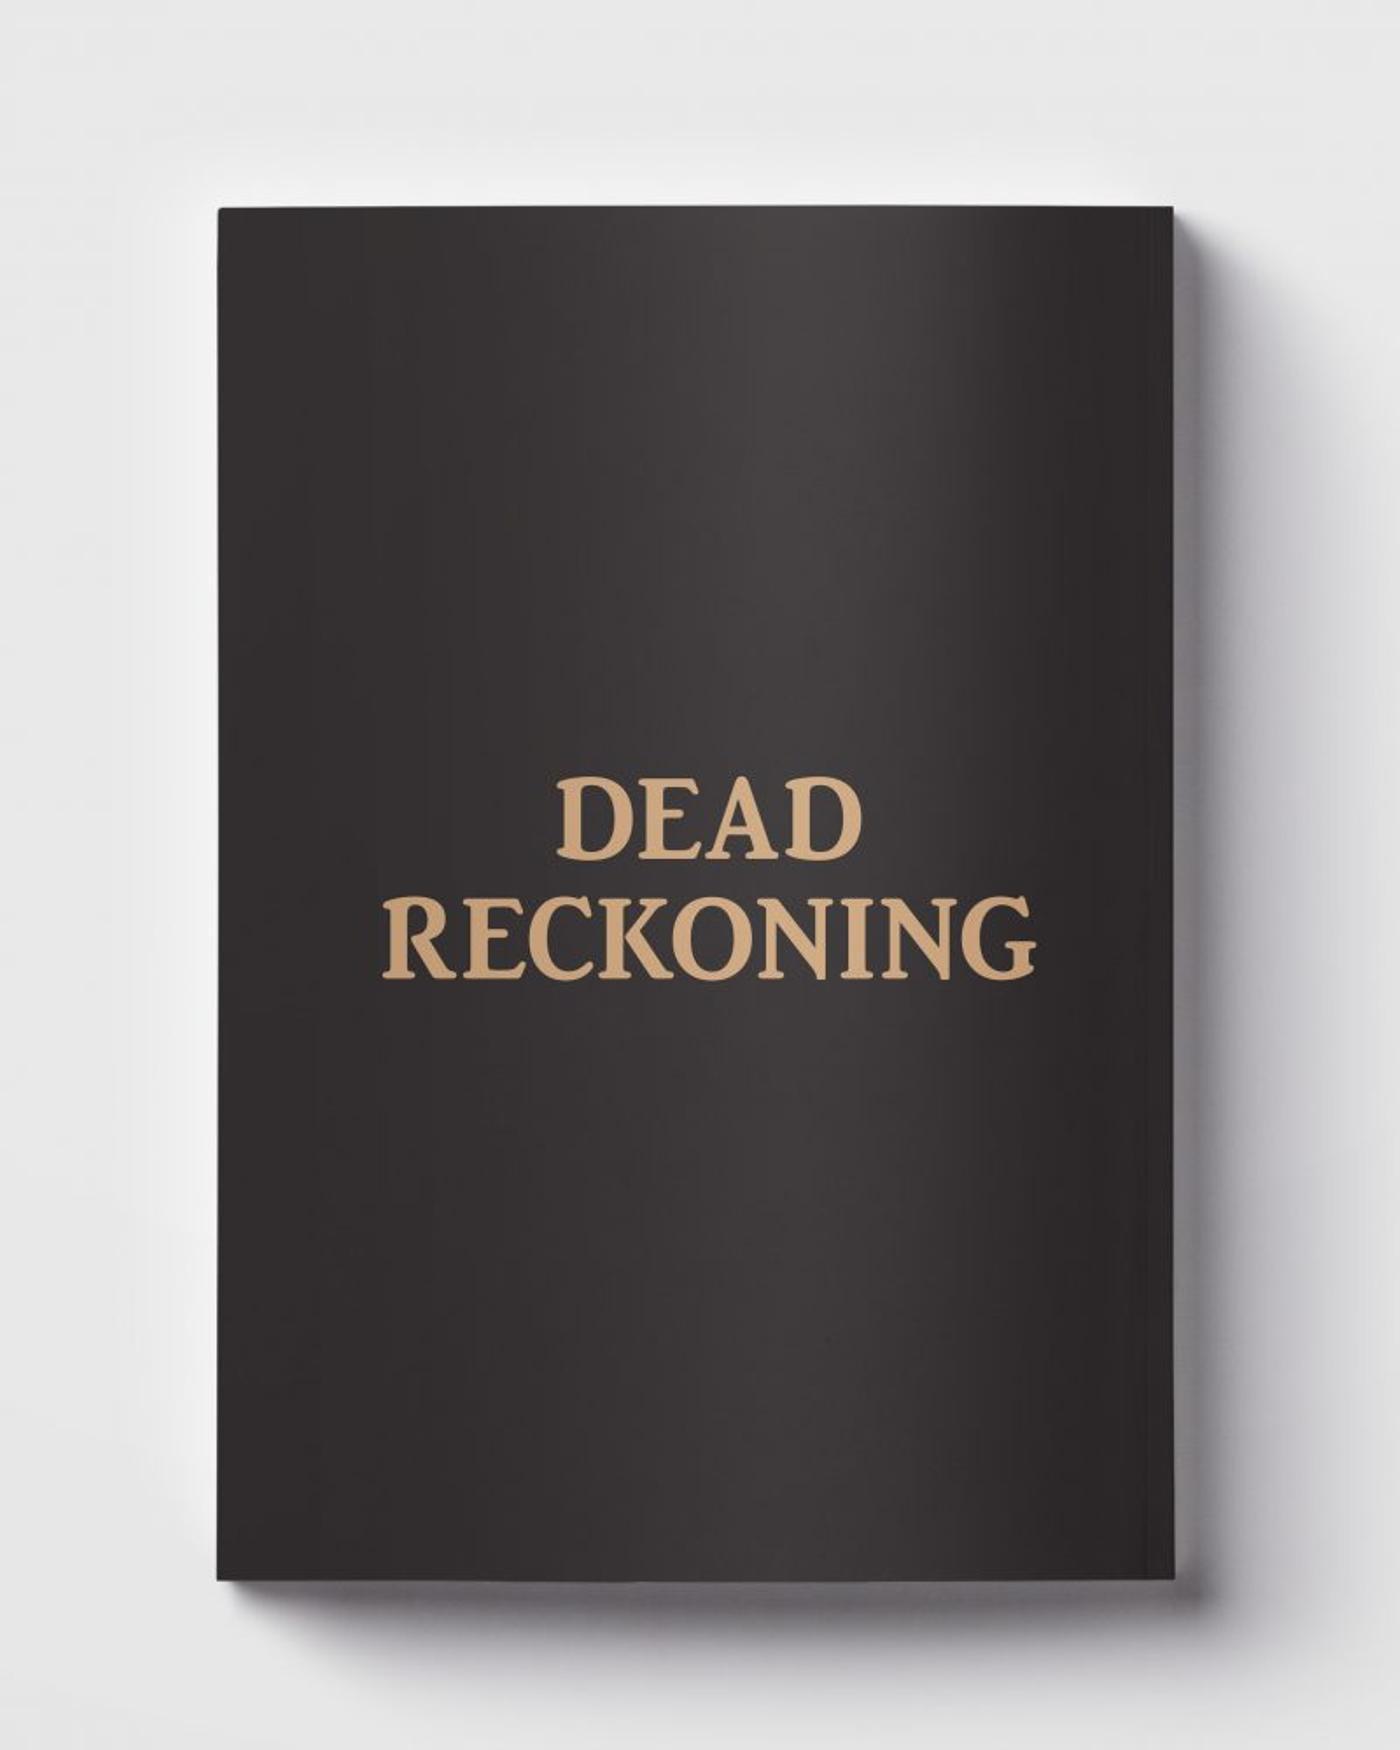 deadreckcovermockuphiresgrey-800x1000